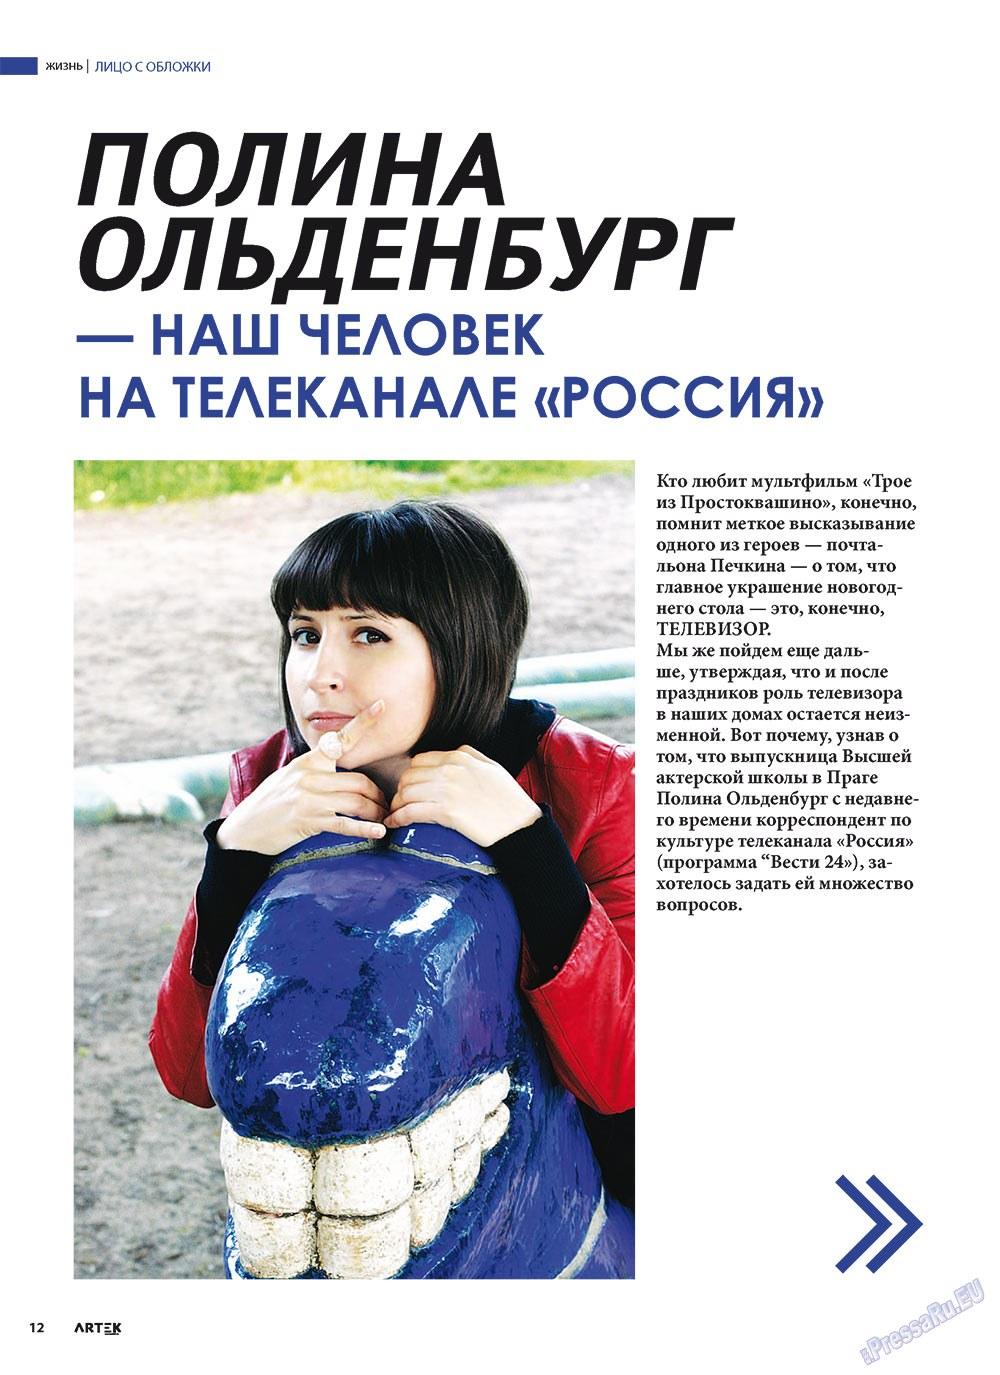 Артек (журнал). 2011 год, номер 1, стр. 14